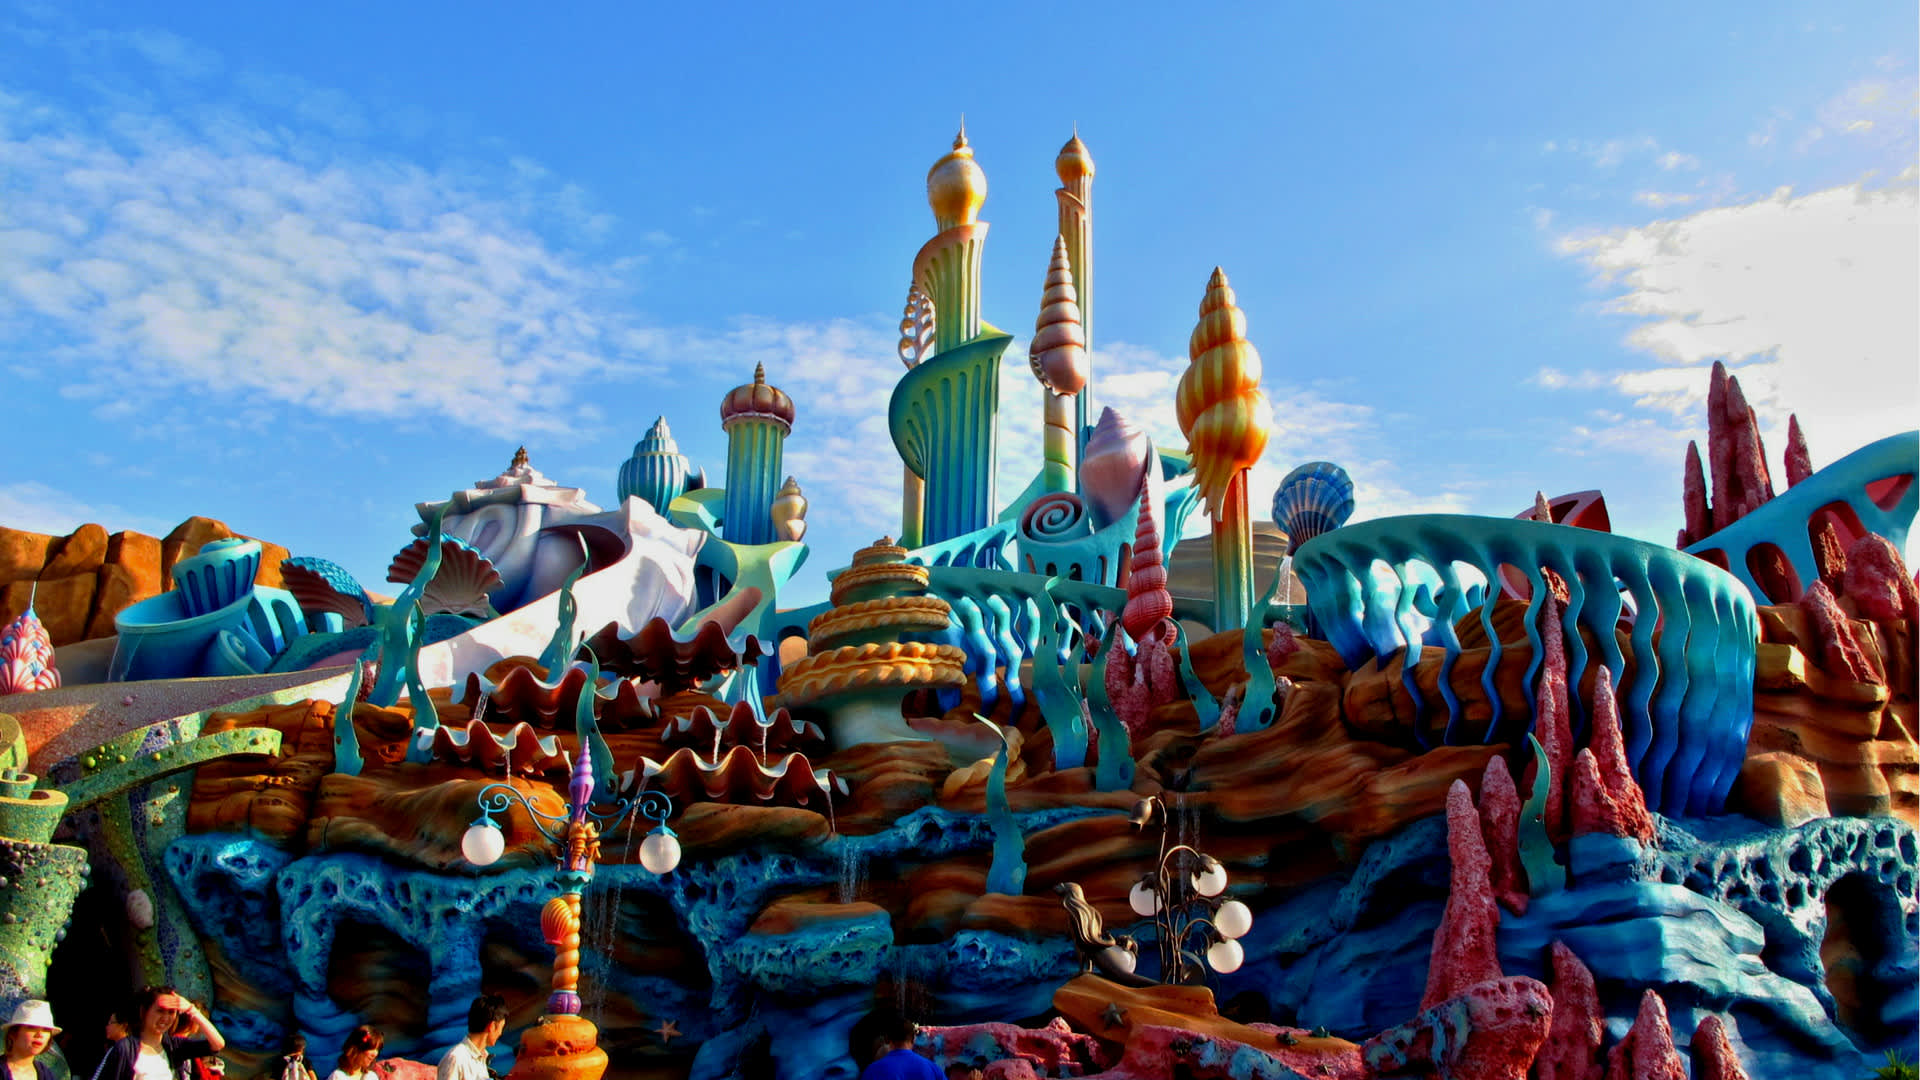 The Klook Guide To Tokyo DisneySea - Klook